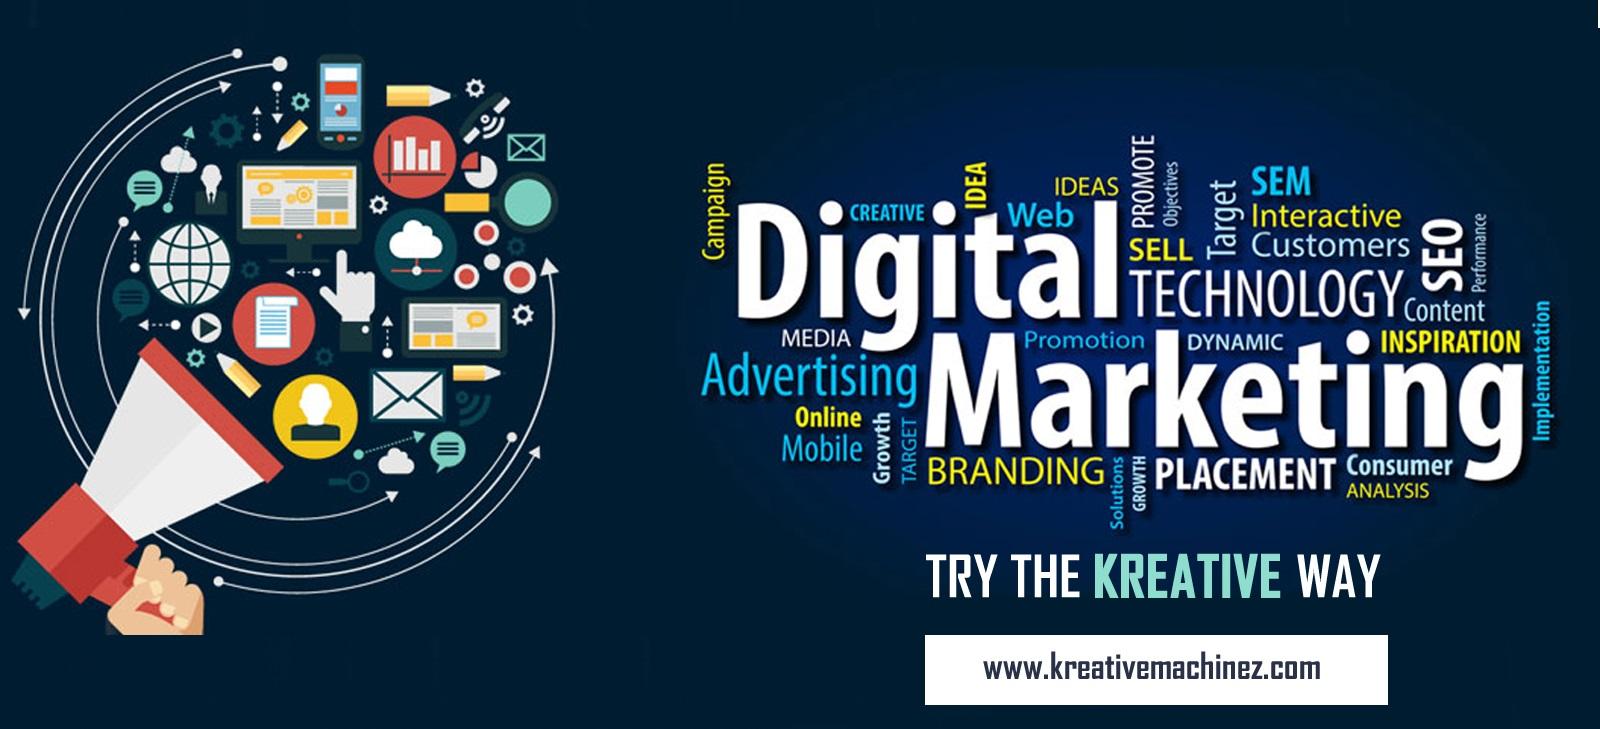 digital marketing services provider in Kolkata